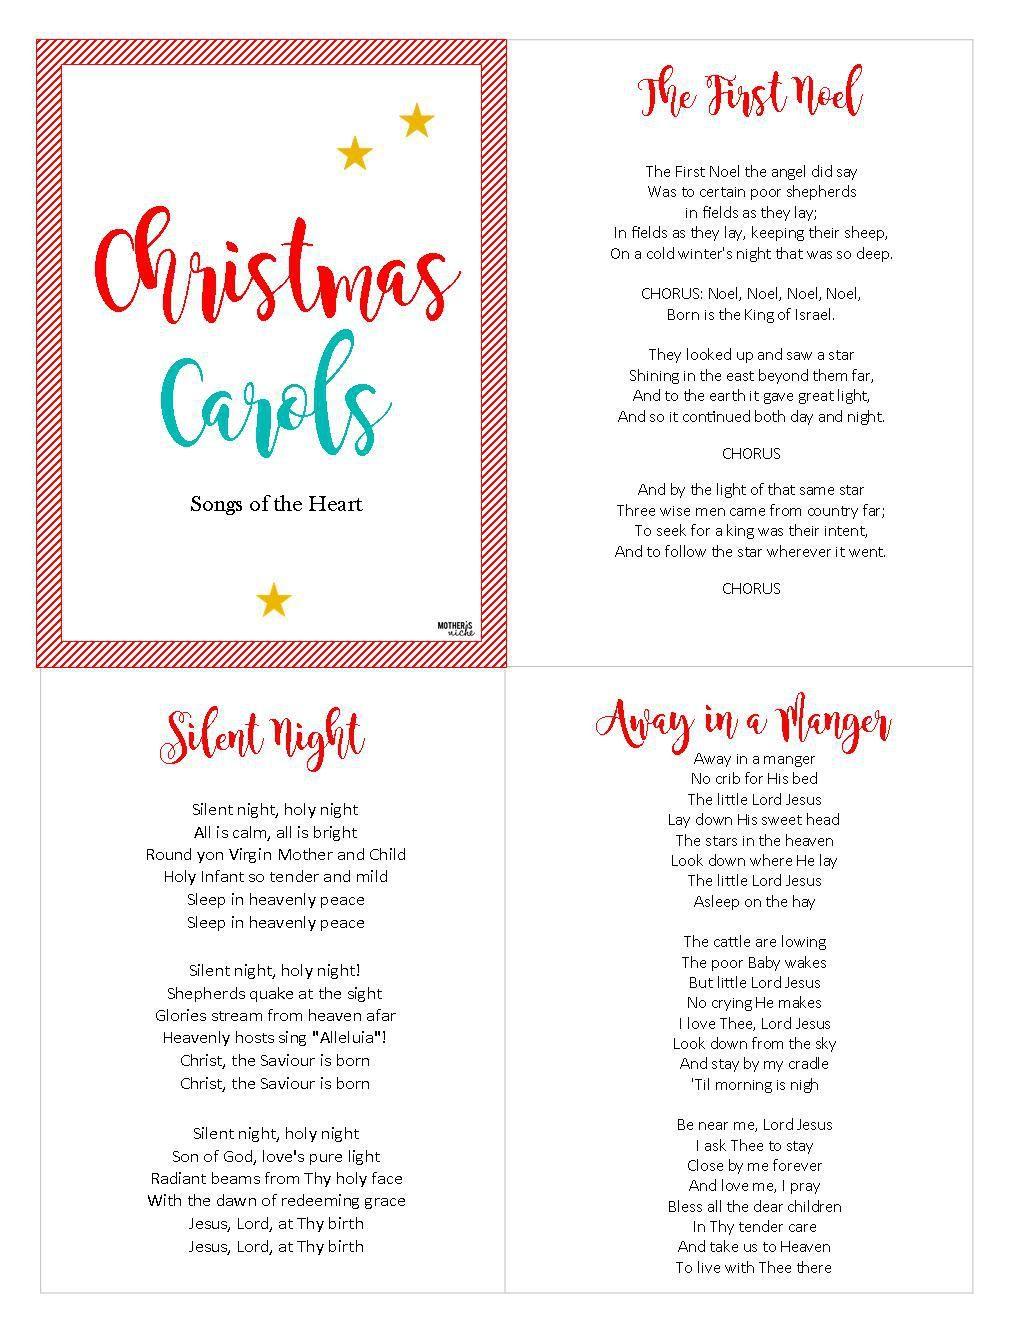 image relating to Printable Christmas Carols Booklet named CHRIST-Based Xmas CAROLS: Cost-free PRINTABLE Xmas